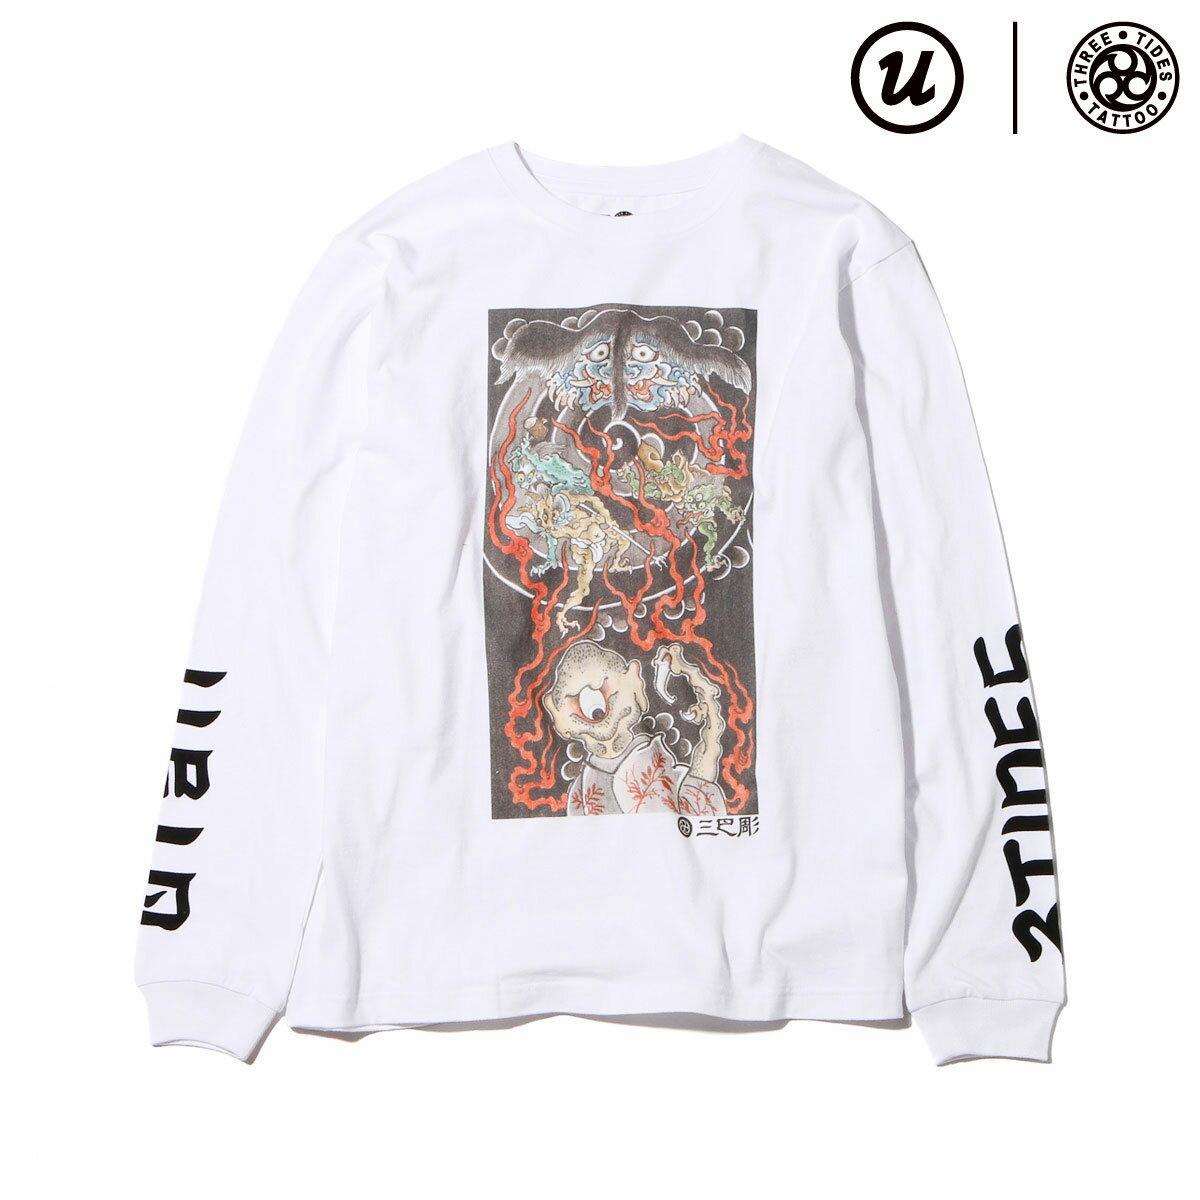 "UBIQ THREE TIDES TATTOO × UBIQ ""IREZUMI"" LS T-SHIRT(Youkai) Designed by Ganji(スリータイズタトゥー ユービック イレズミ ロングスリーブ Tシャツ(ヨウカイ) デザインド バイ ガンジー)(WHITE)17SS-I"